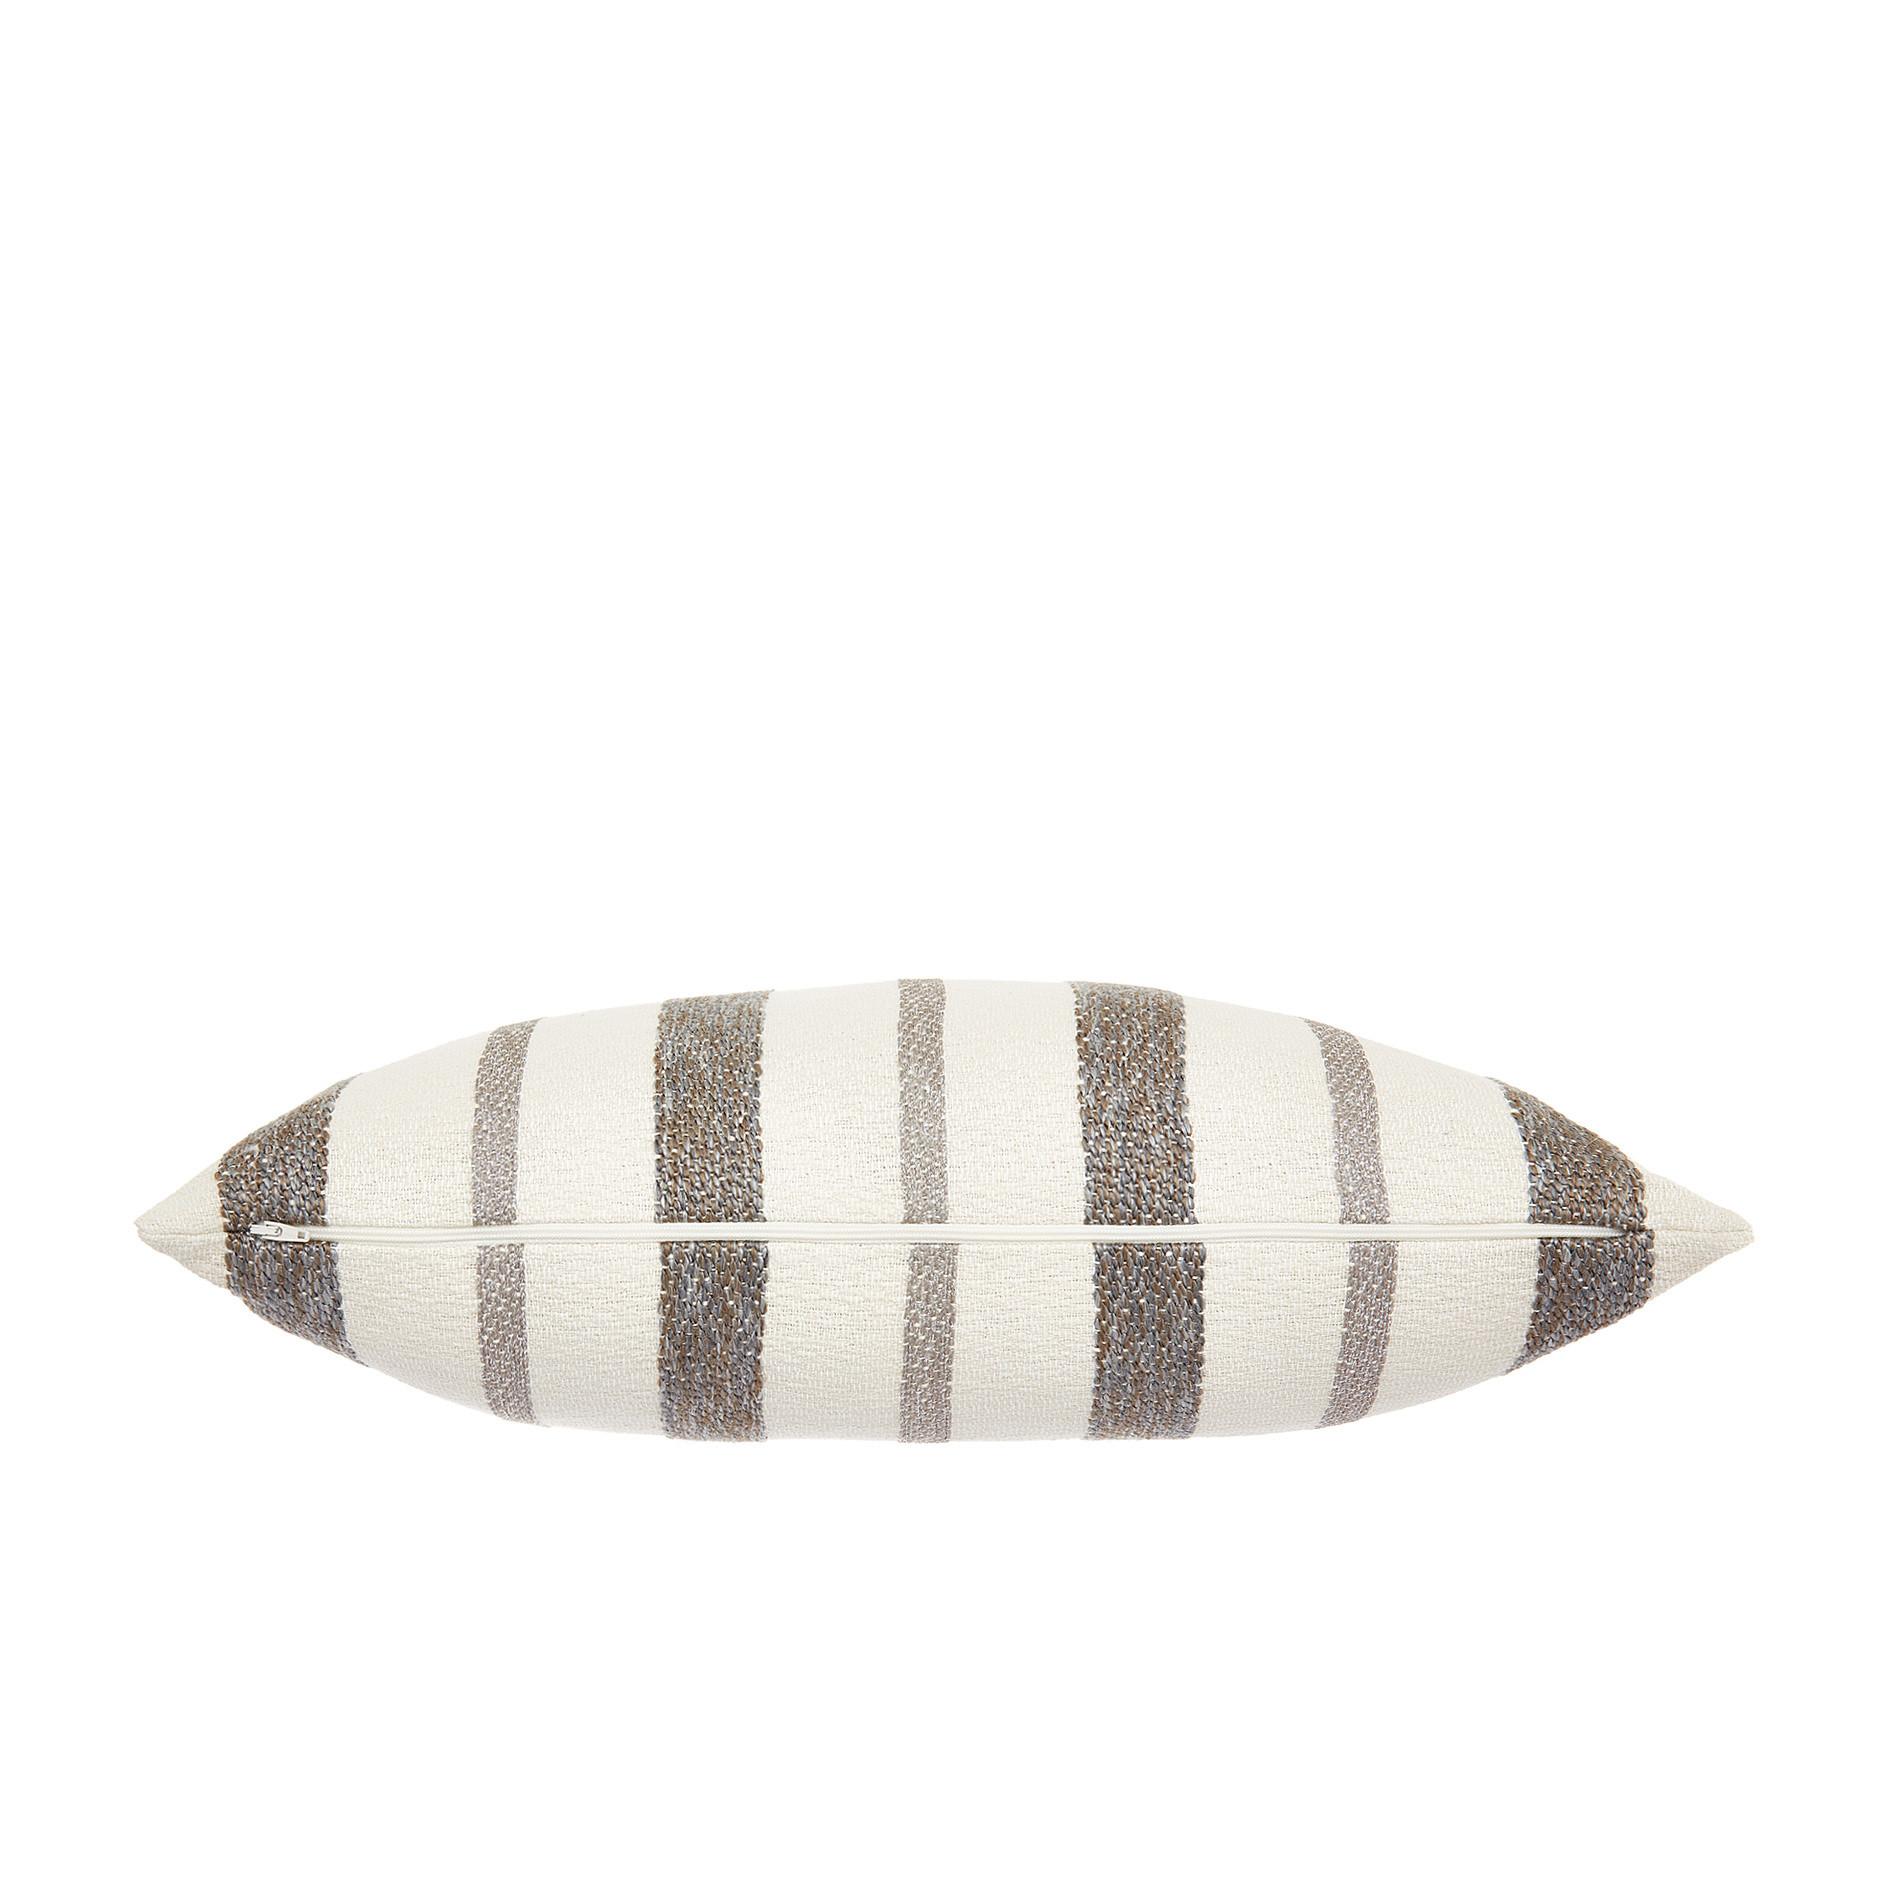 Cuscino misto cotone a righe 35x55cm, Grigio, large image number 1